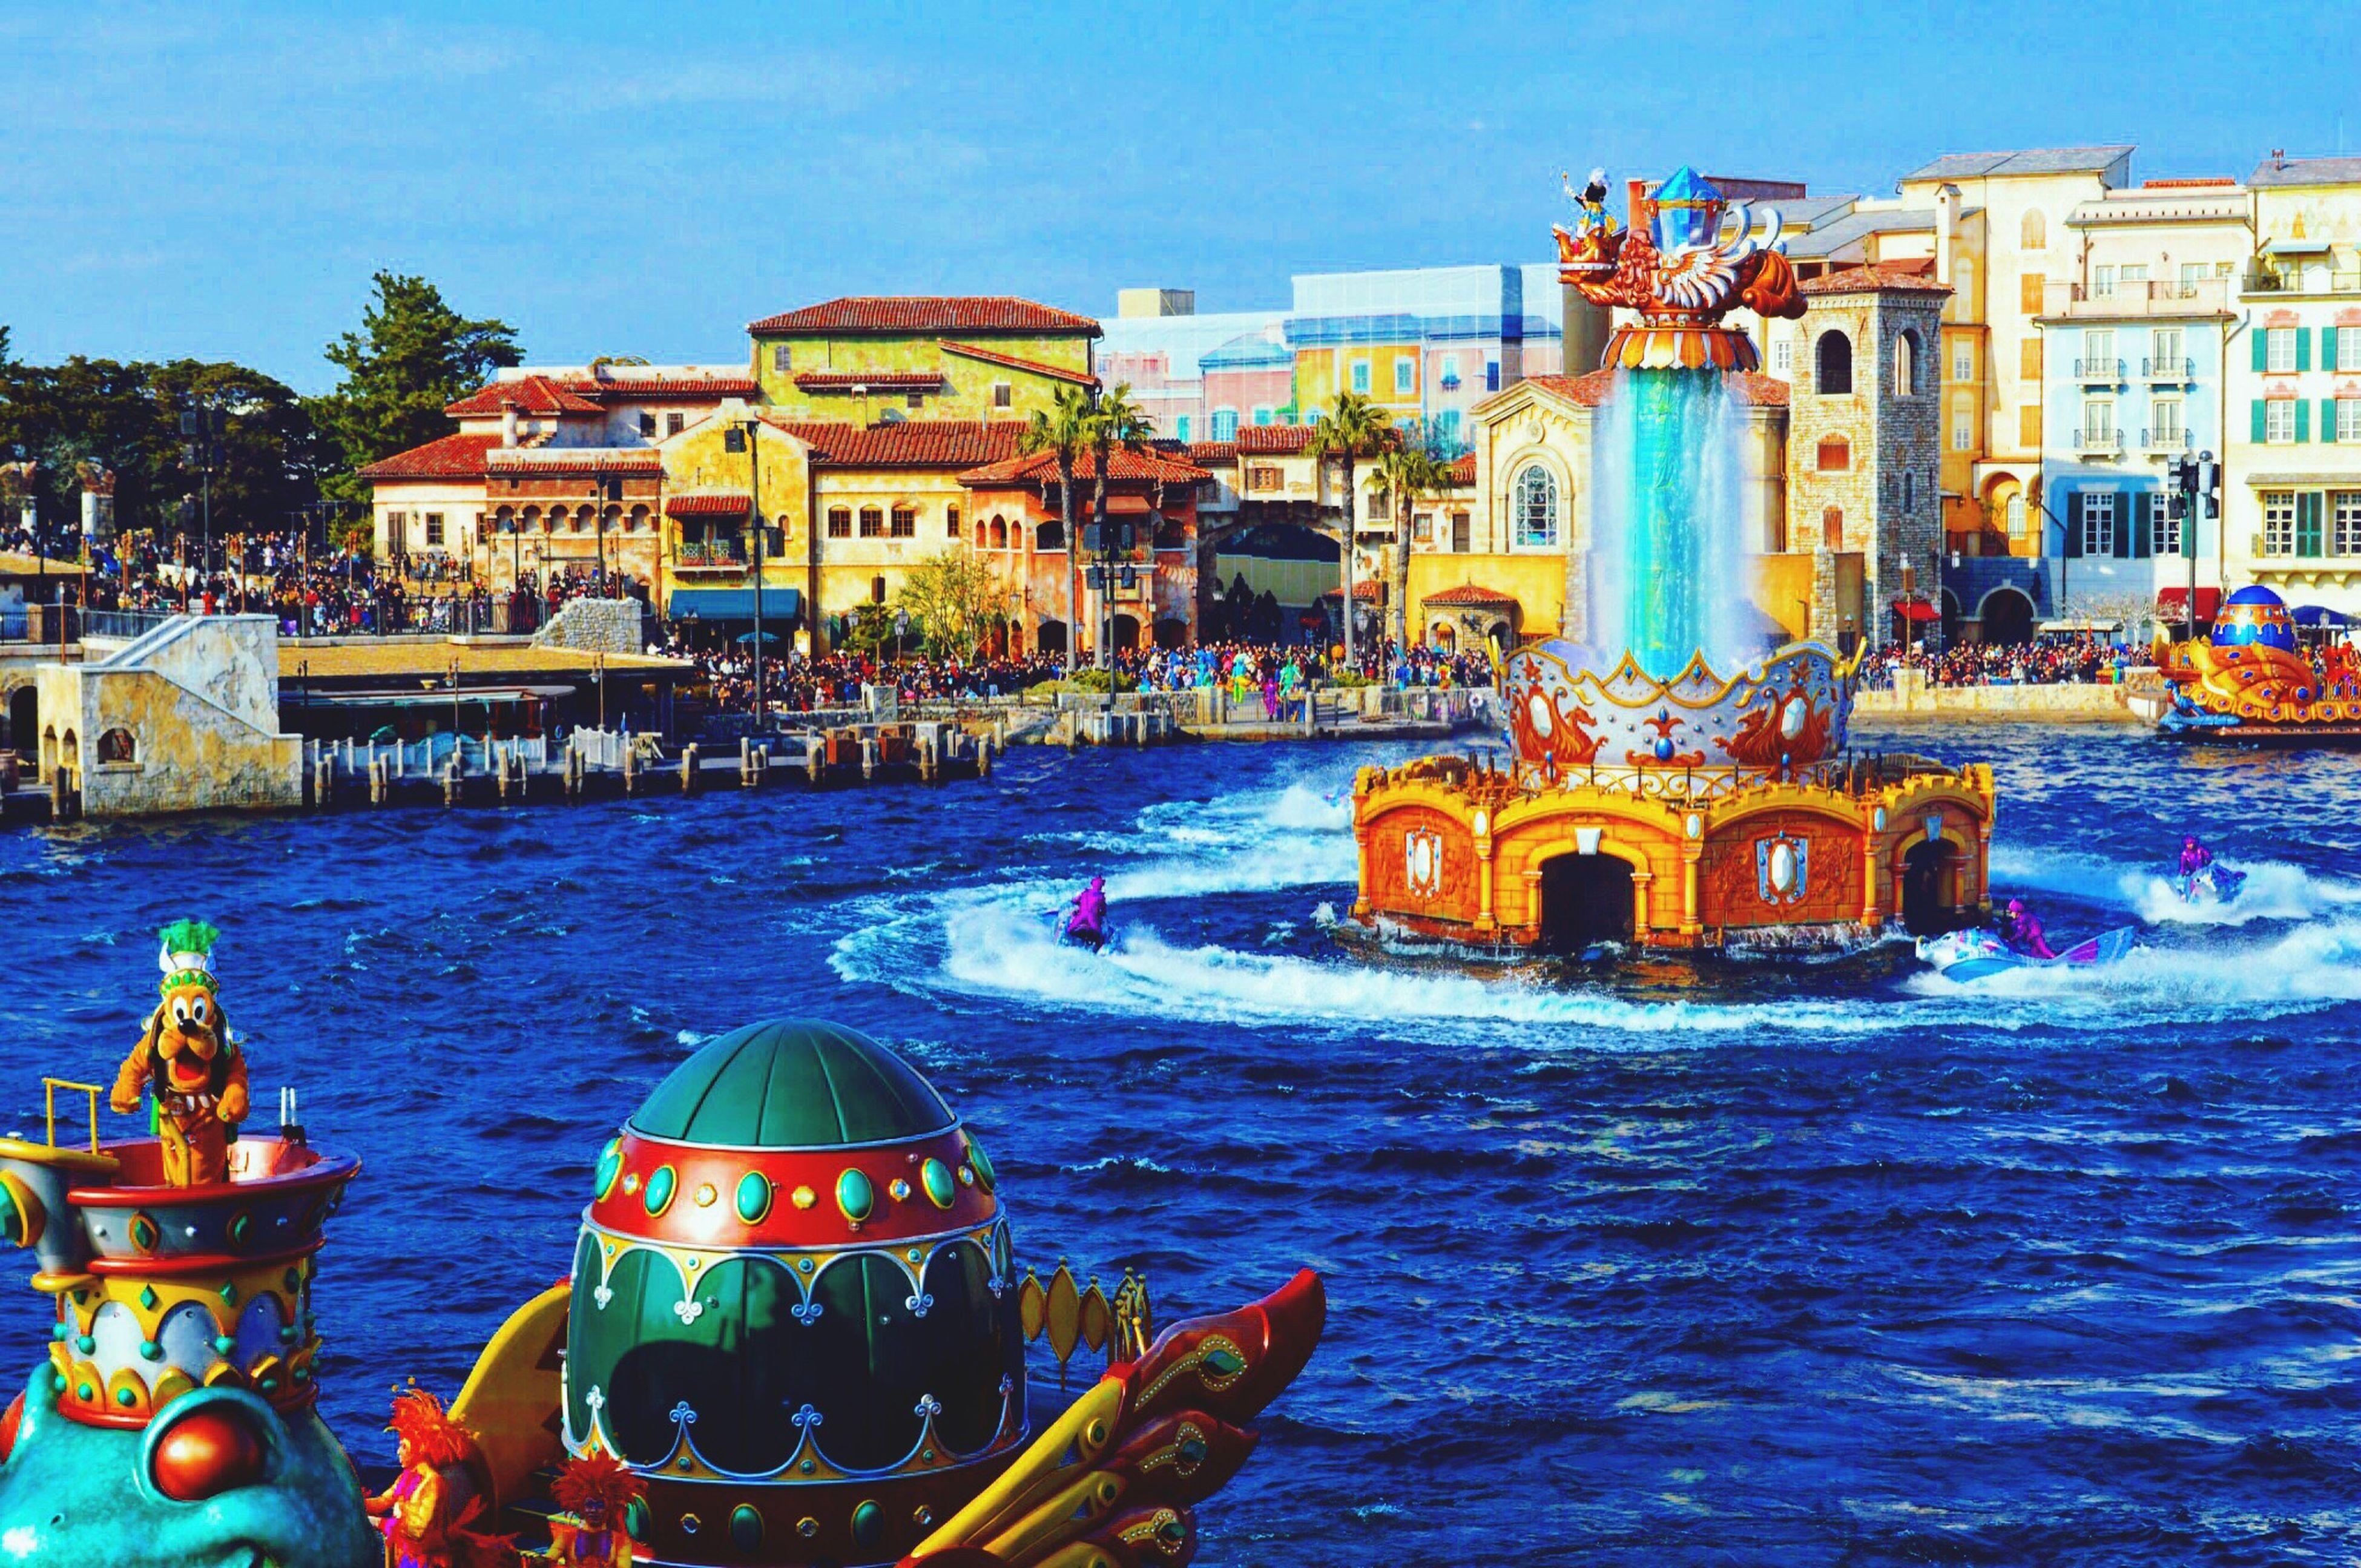 Water Architecture Day Building Exterior Built Structure Outdoors Waterfront Nautical Vessel Sea Real People Sky Nature 東京ディズニーリゾート 東京ディズニーシー レジェンドオブミシカ DisneySea Disneyresort グーフィー Goofy Watershow ディズニー Disney Japan